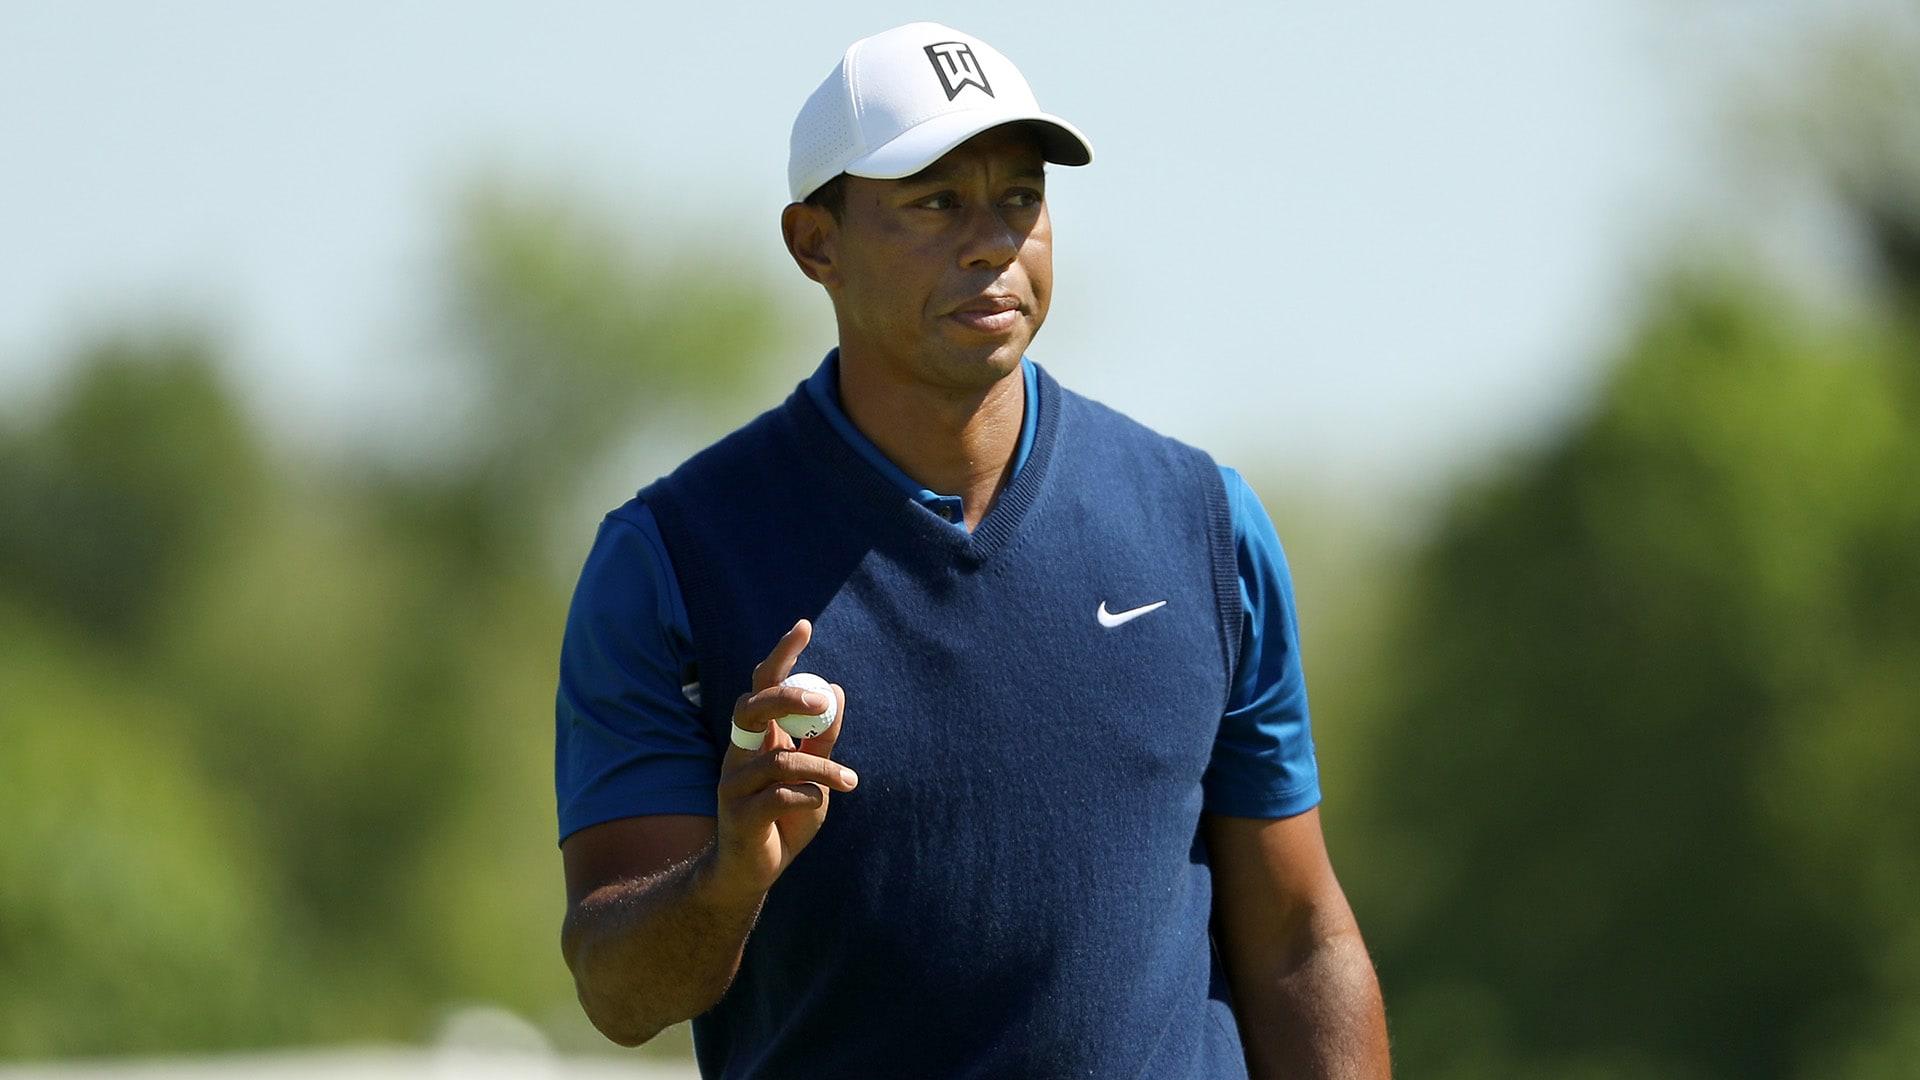 503ef133 Highlights: Tiger Woods' first round of 2019 PGA Championship | Golf ...